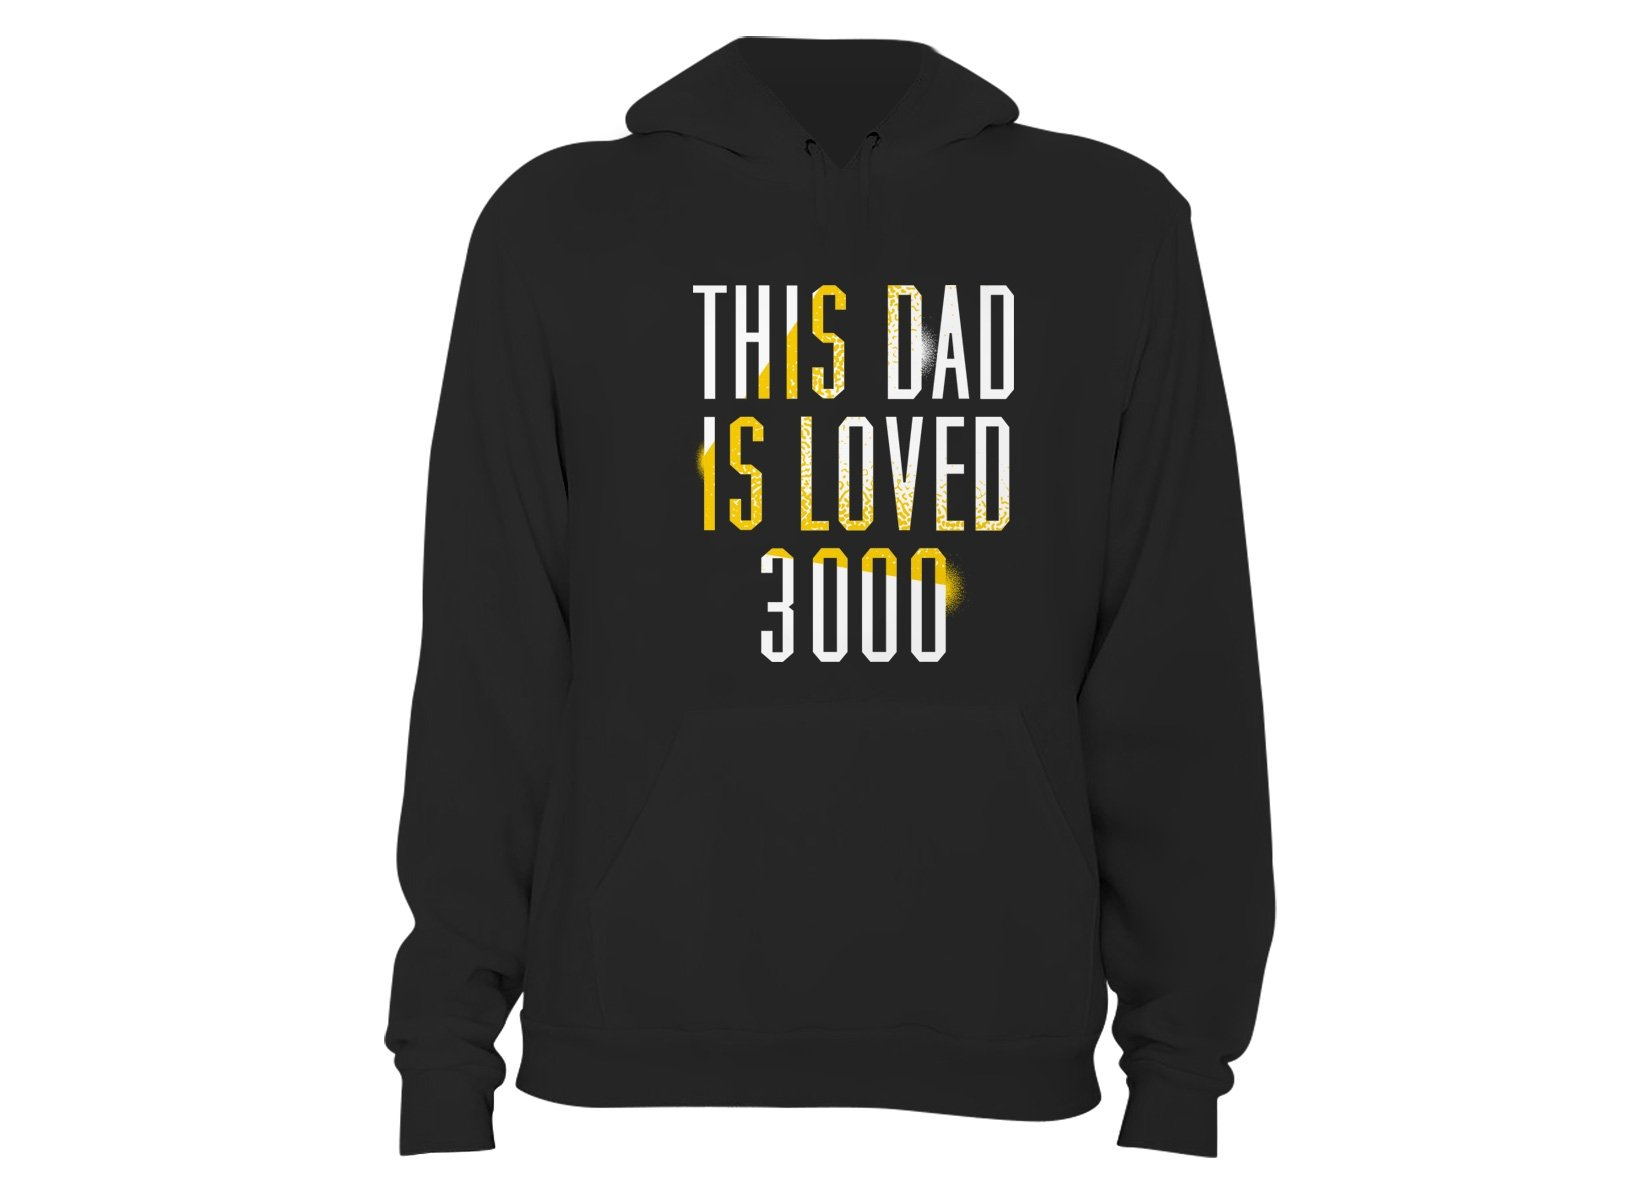 This Dad Is Loved 3000 on Hoodie